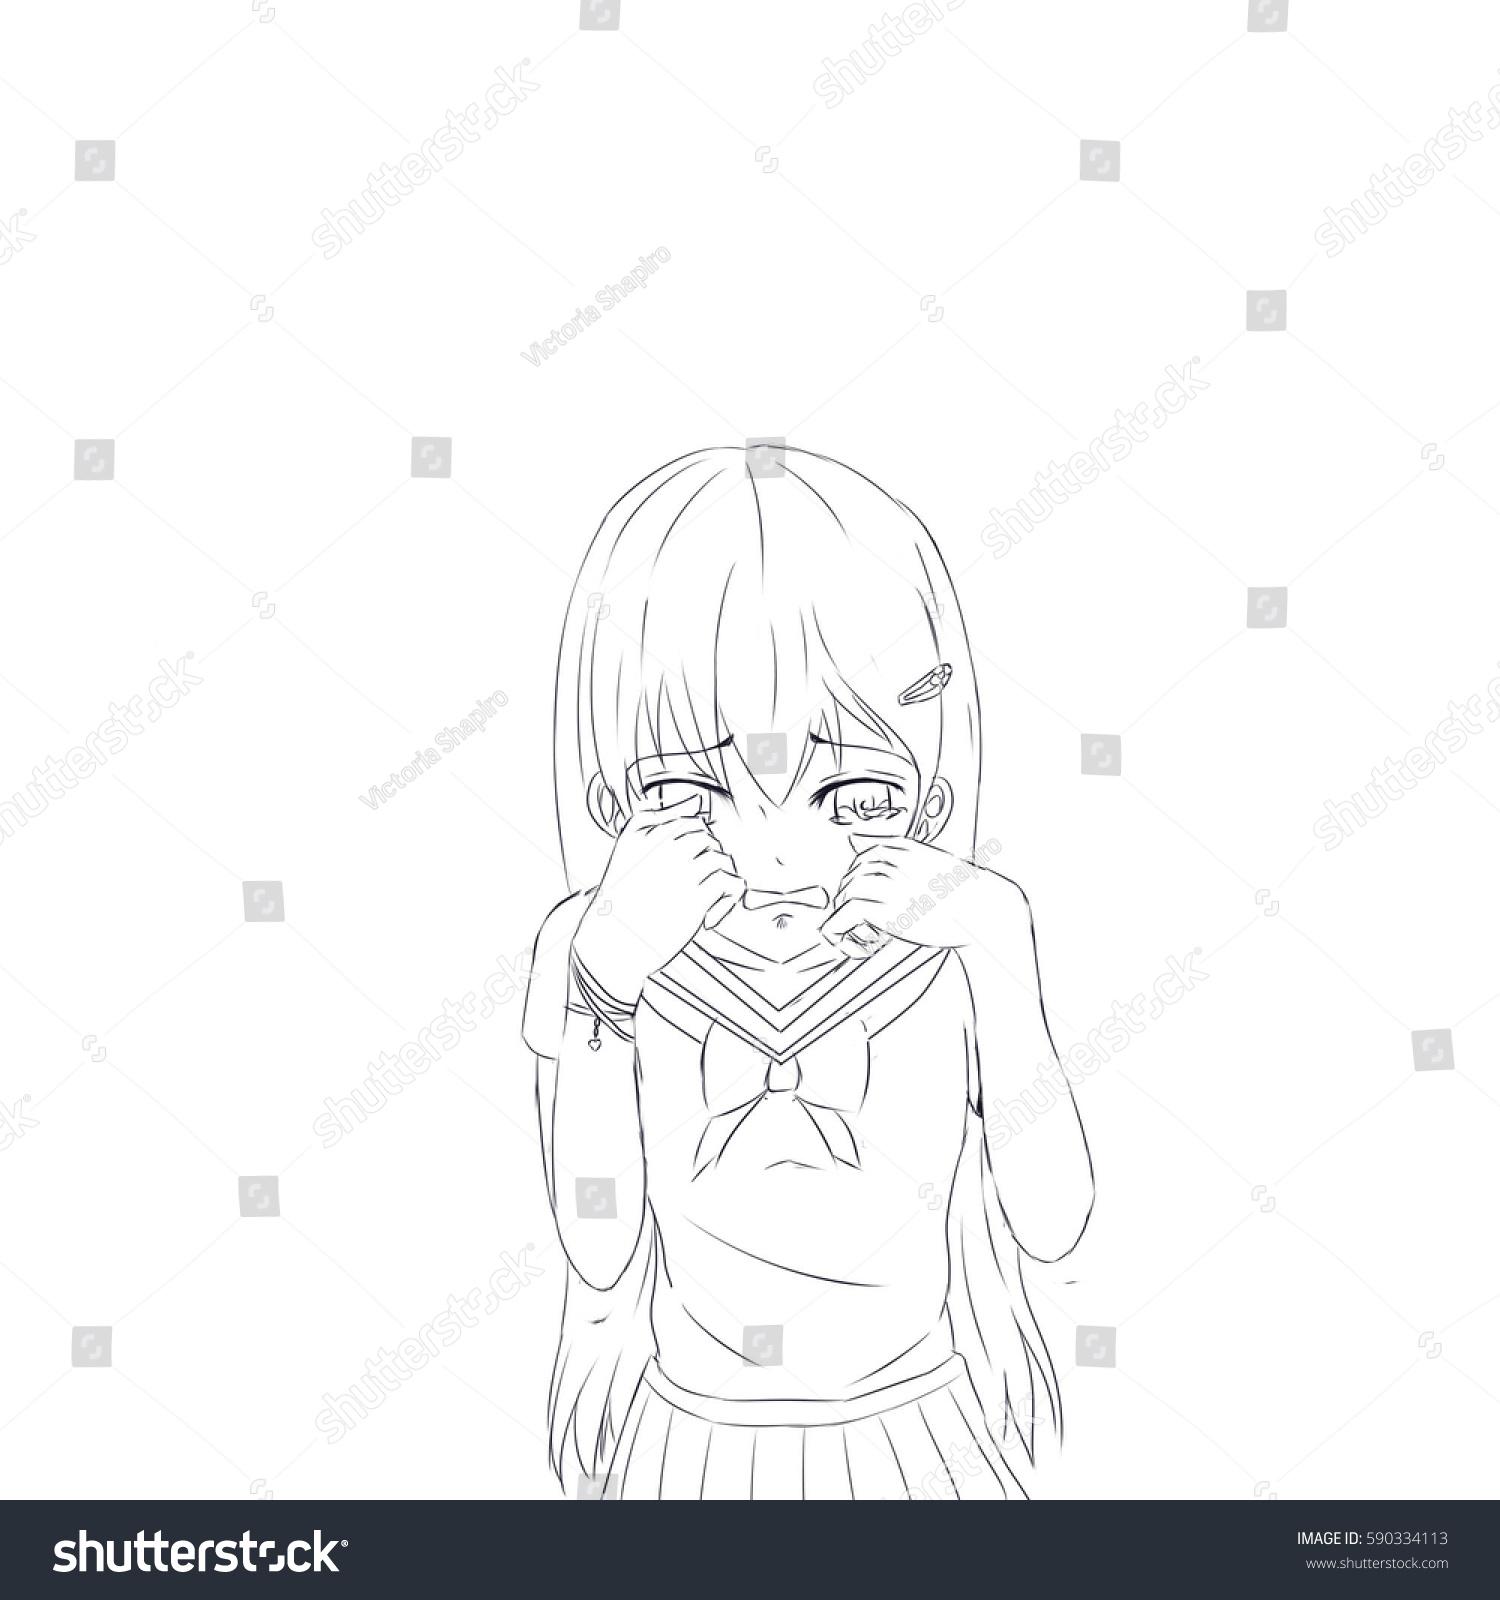 Royalty Free Stock Illustration Of Crying Anime School Girl Sad